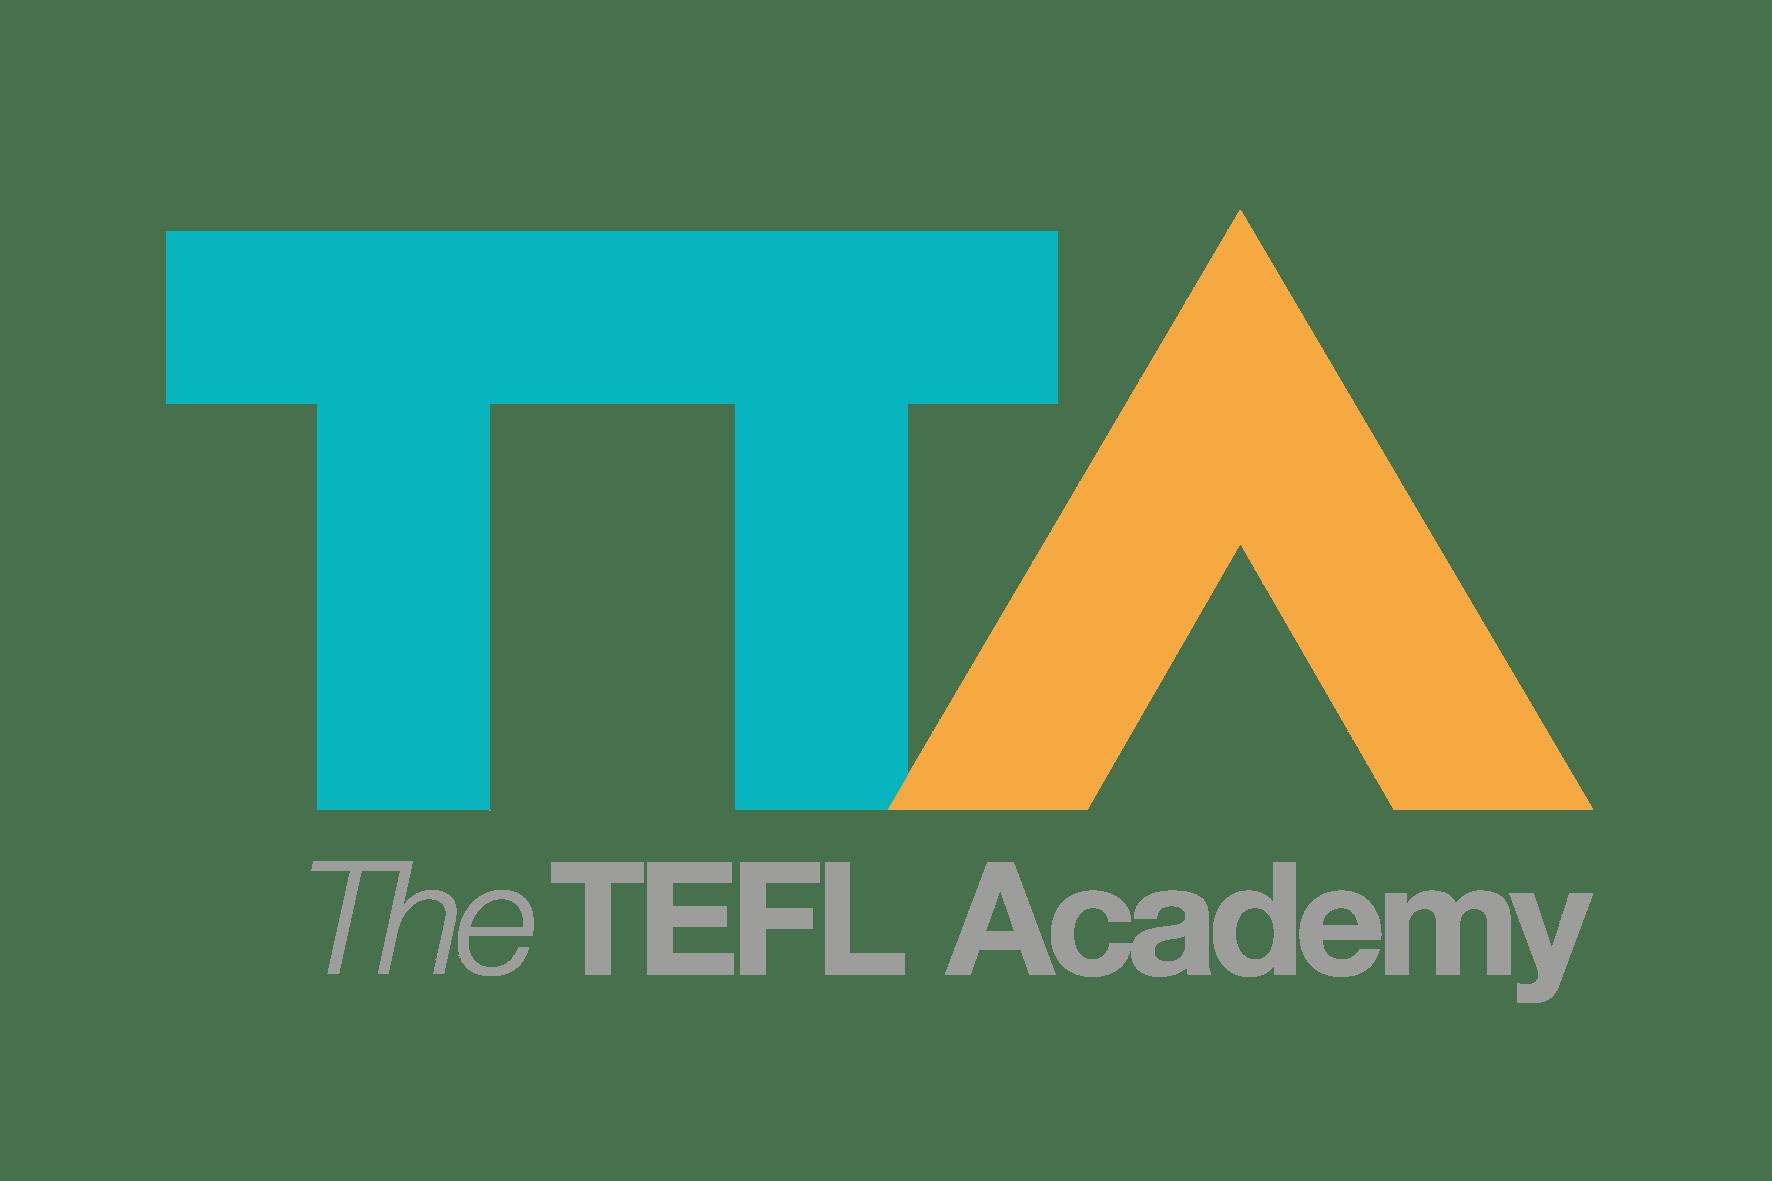 The TEFL Academy reputation